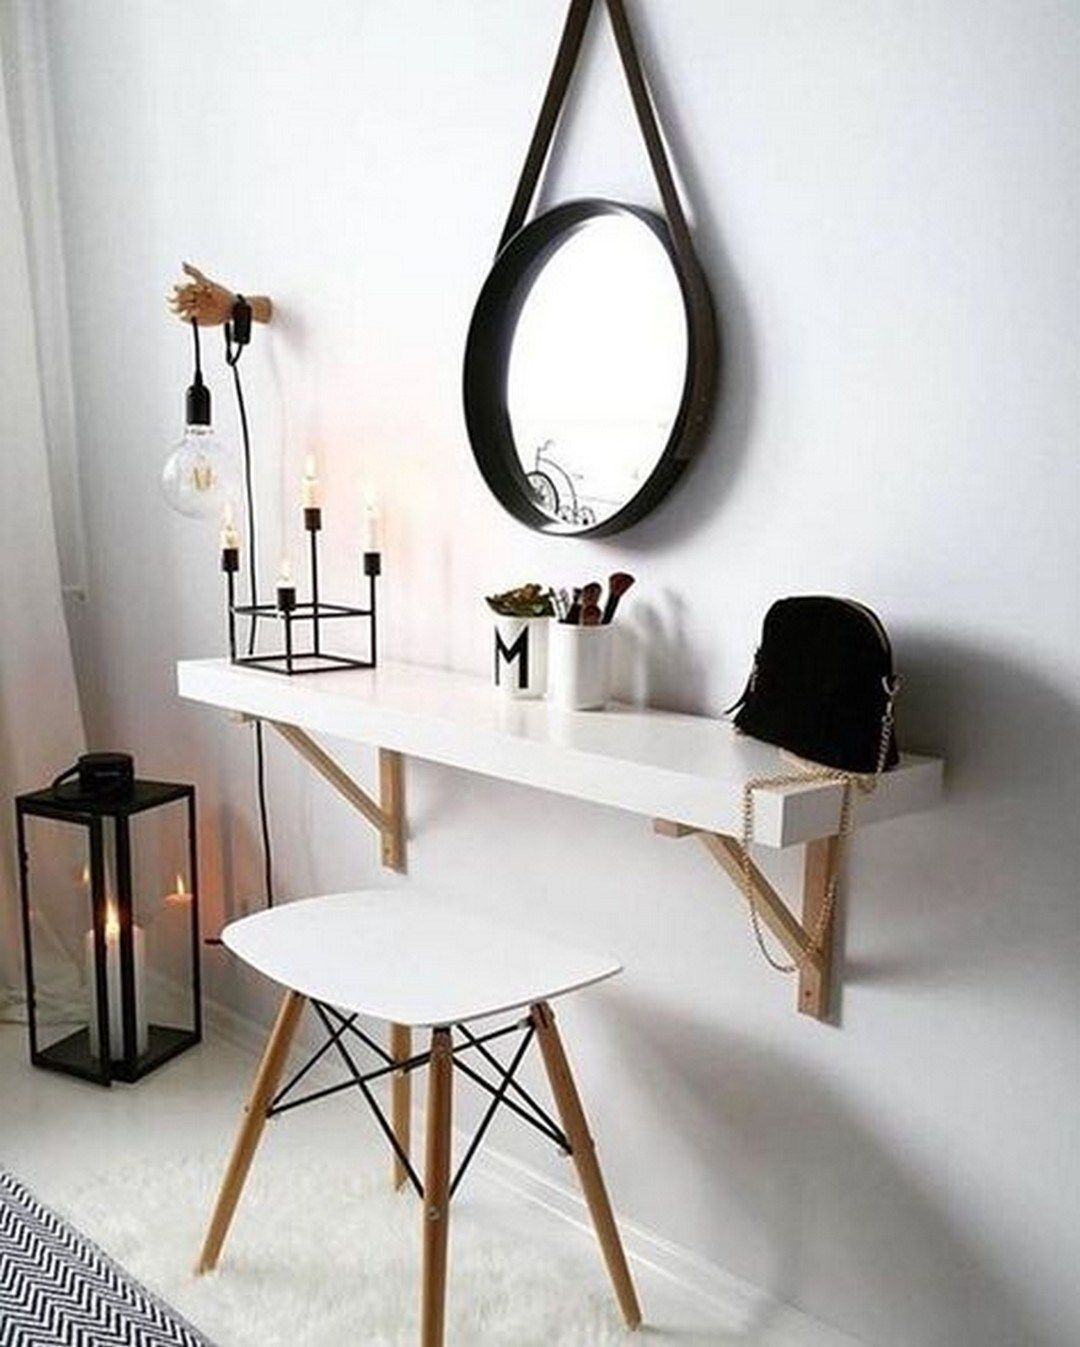 Incredible IKEA Bedroom, Shelves And Storage Ideas (31 is part of Ikea bedroom Shelves - Incredible IKEA Bedroom, Shelves And Storage Ideas (31)